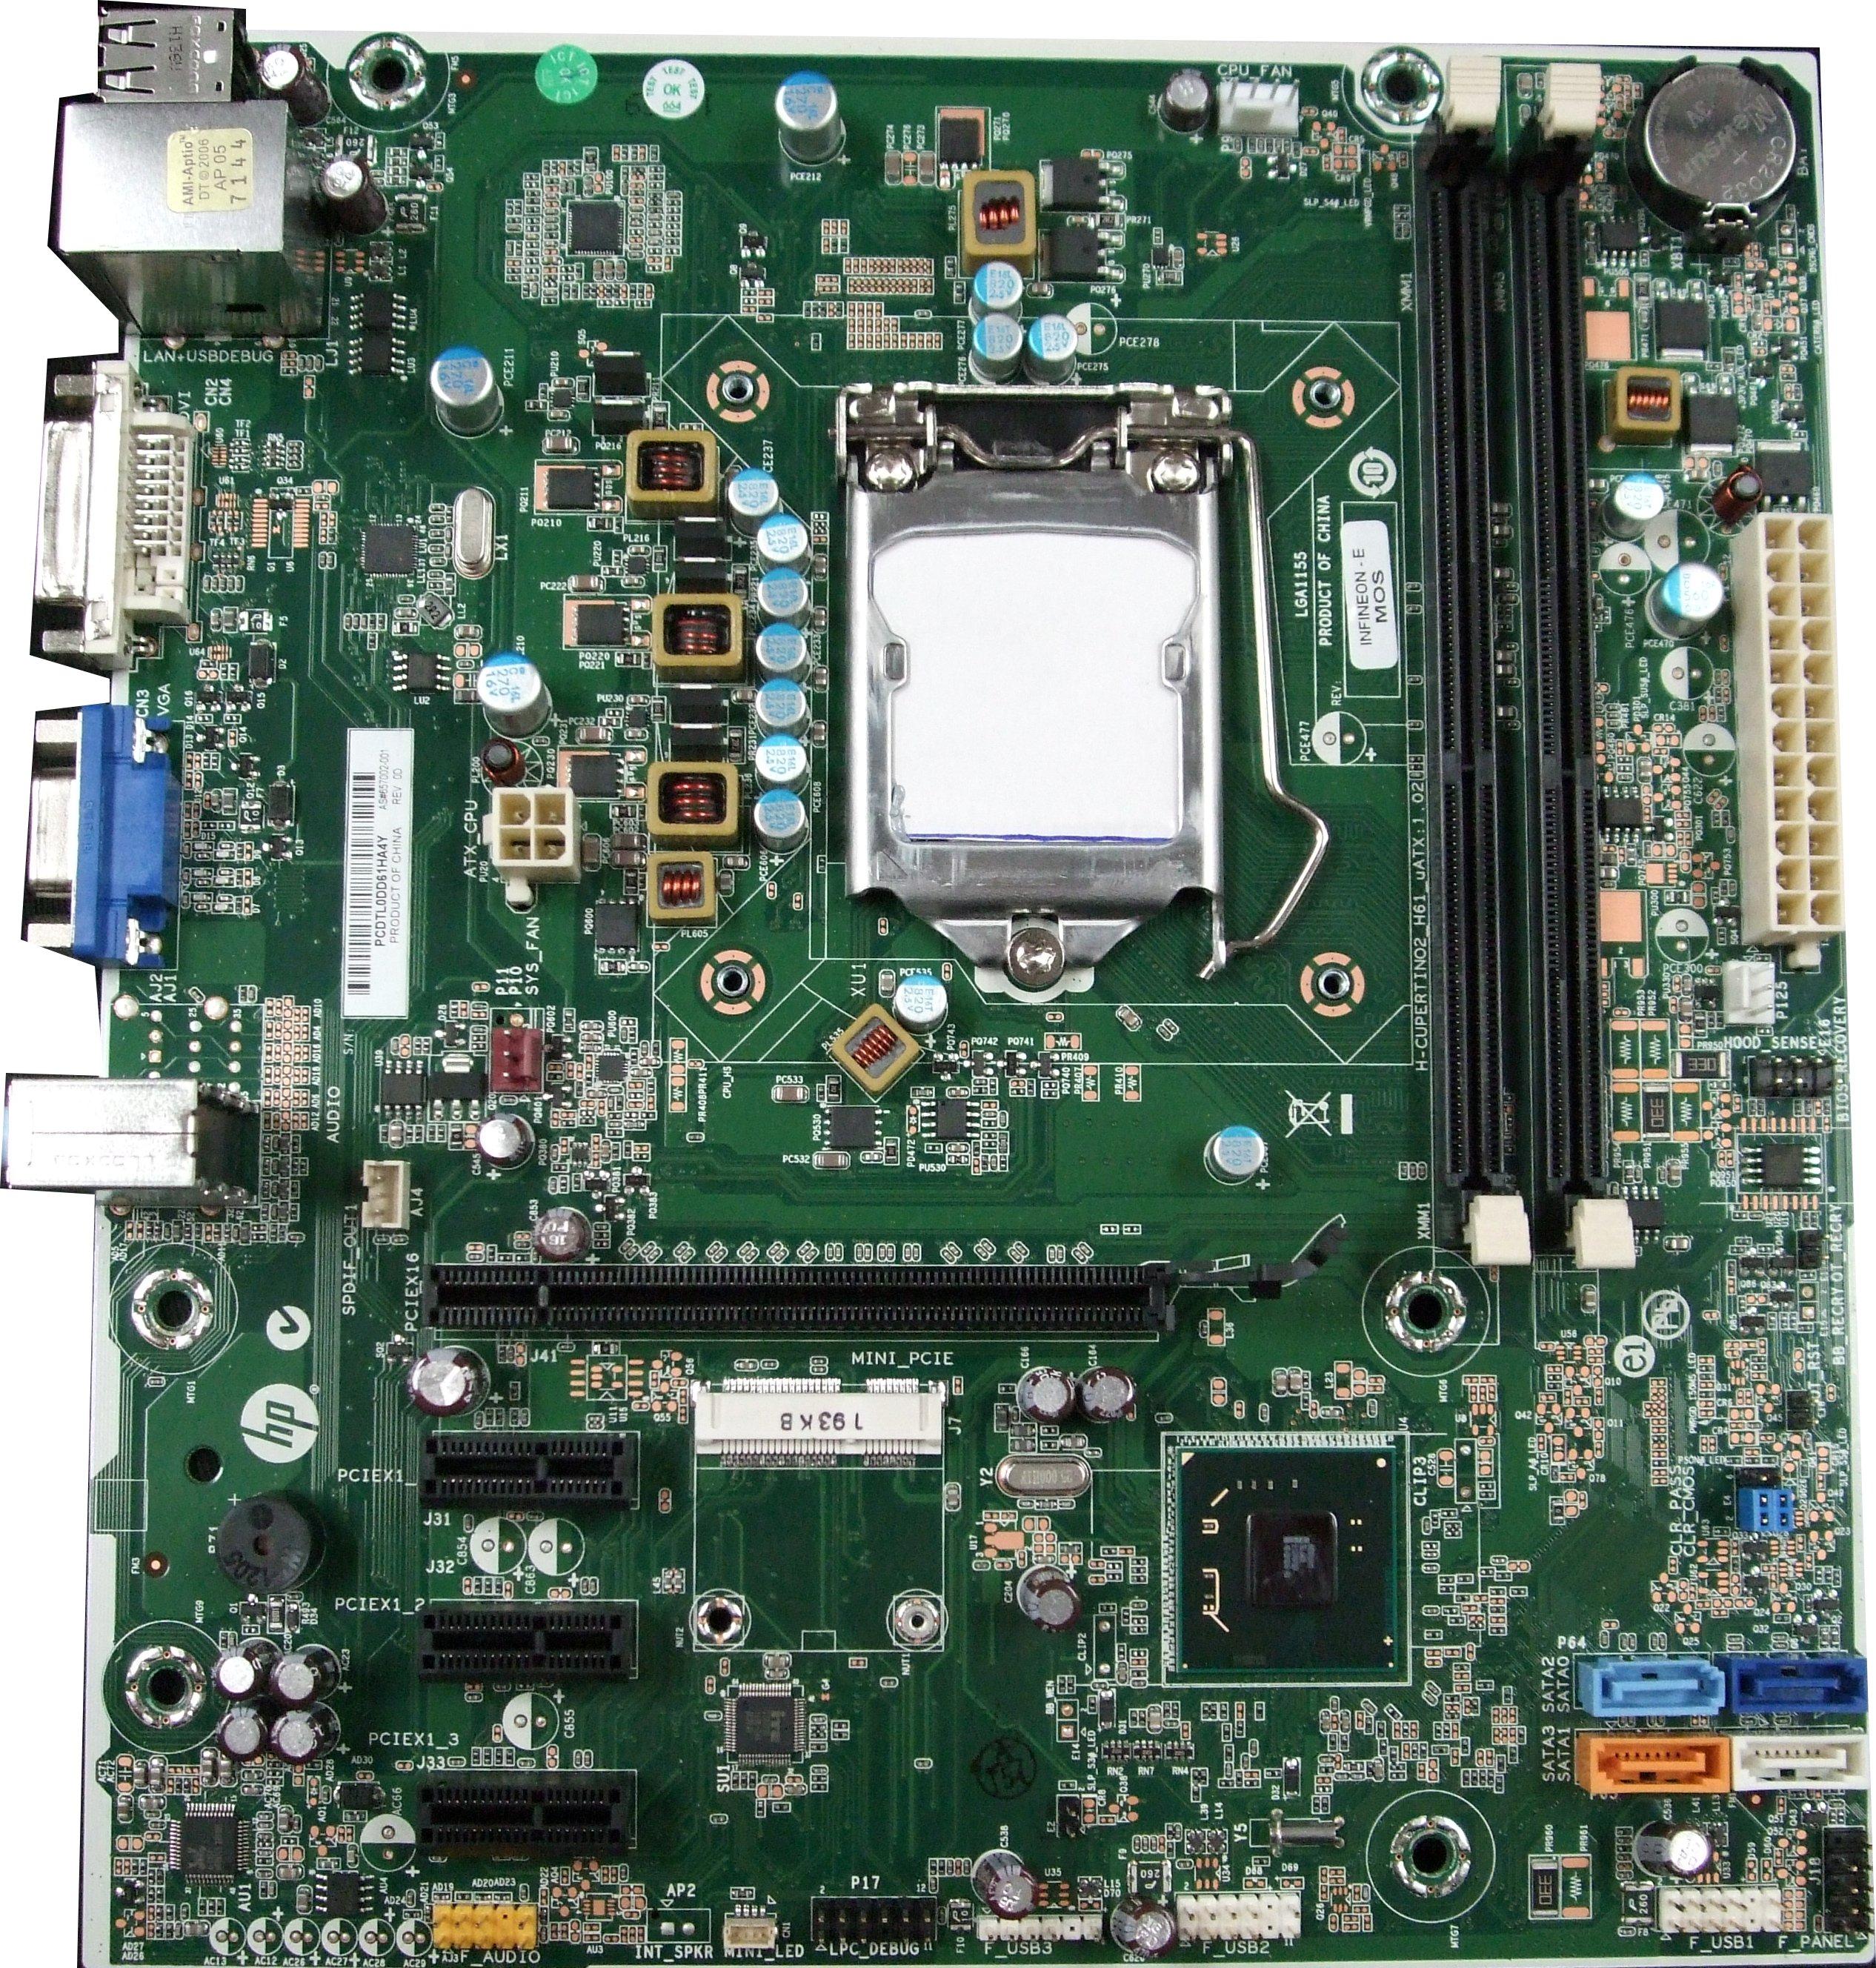 657002-001 HP Infinion - E Socket LGA1155 Motherboard H-CUPERTINO2_H61_uATX:1.02